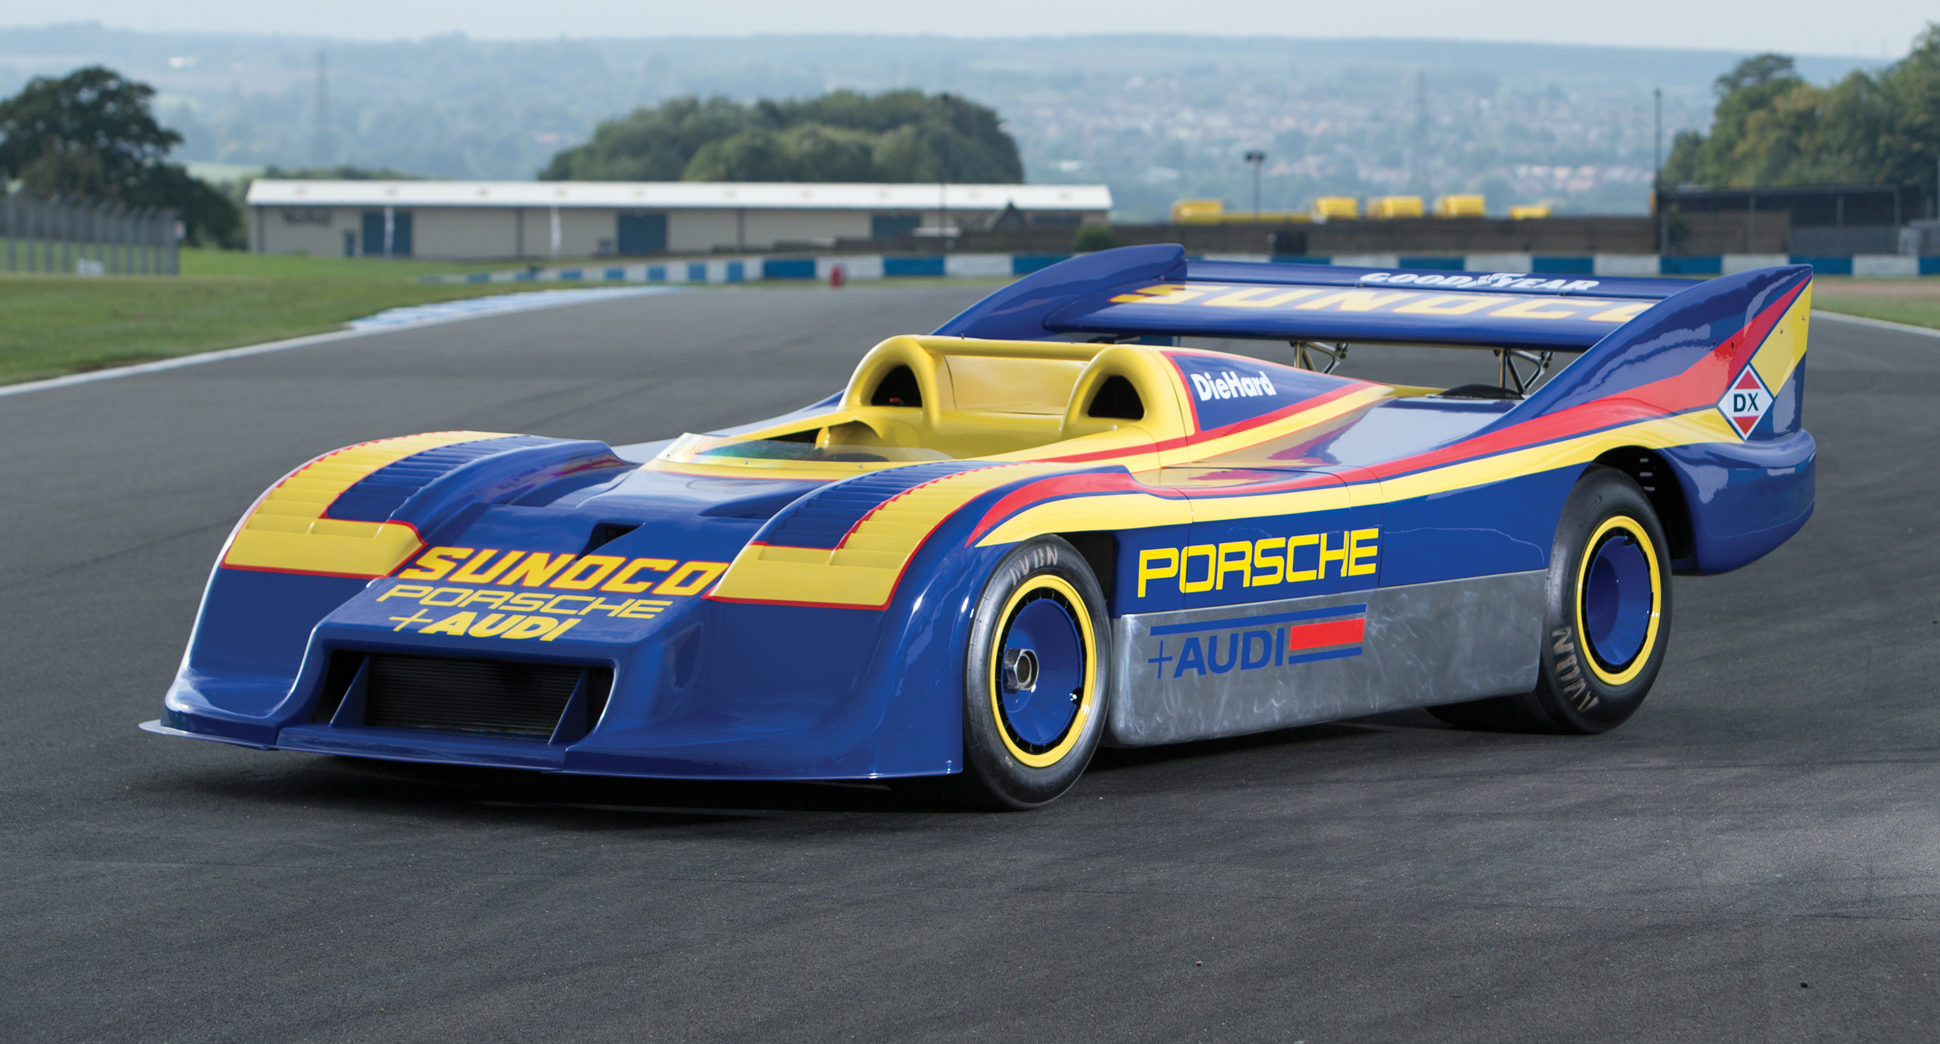 Porsche 917/30 Spyder